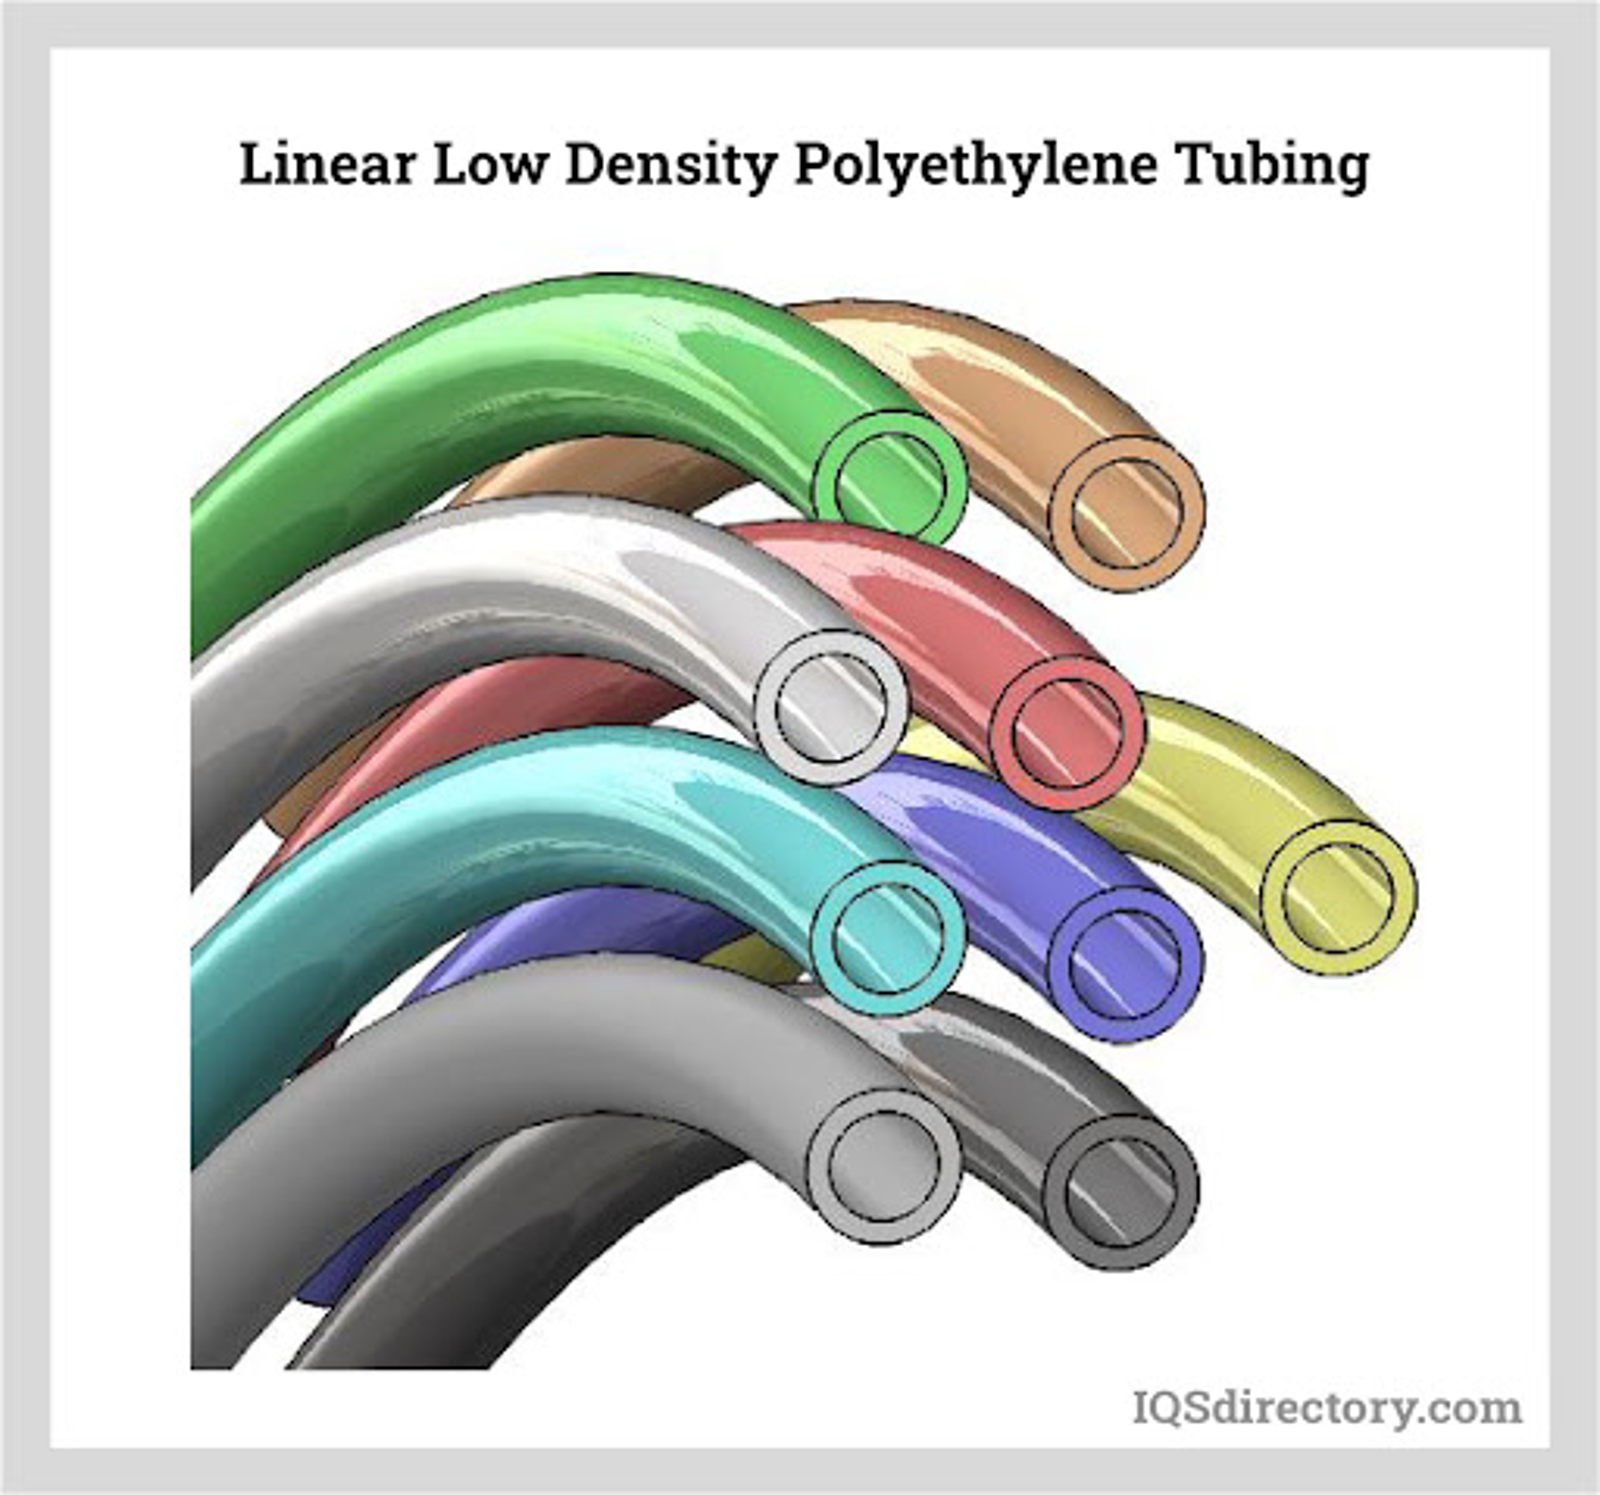 Linear Low Density Polyethylene Tubing